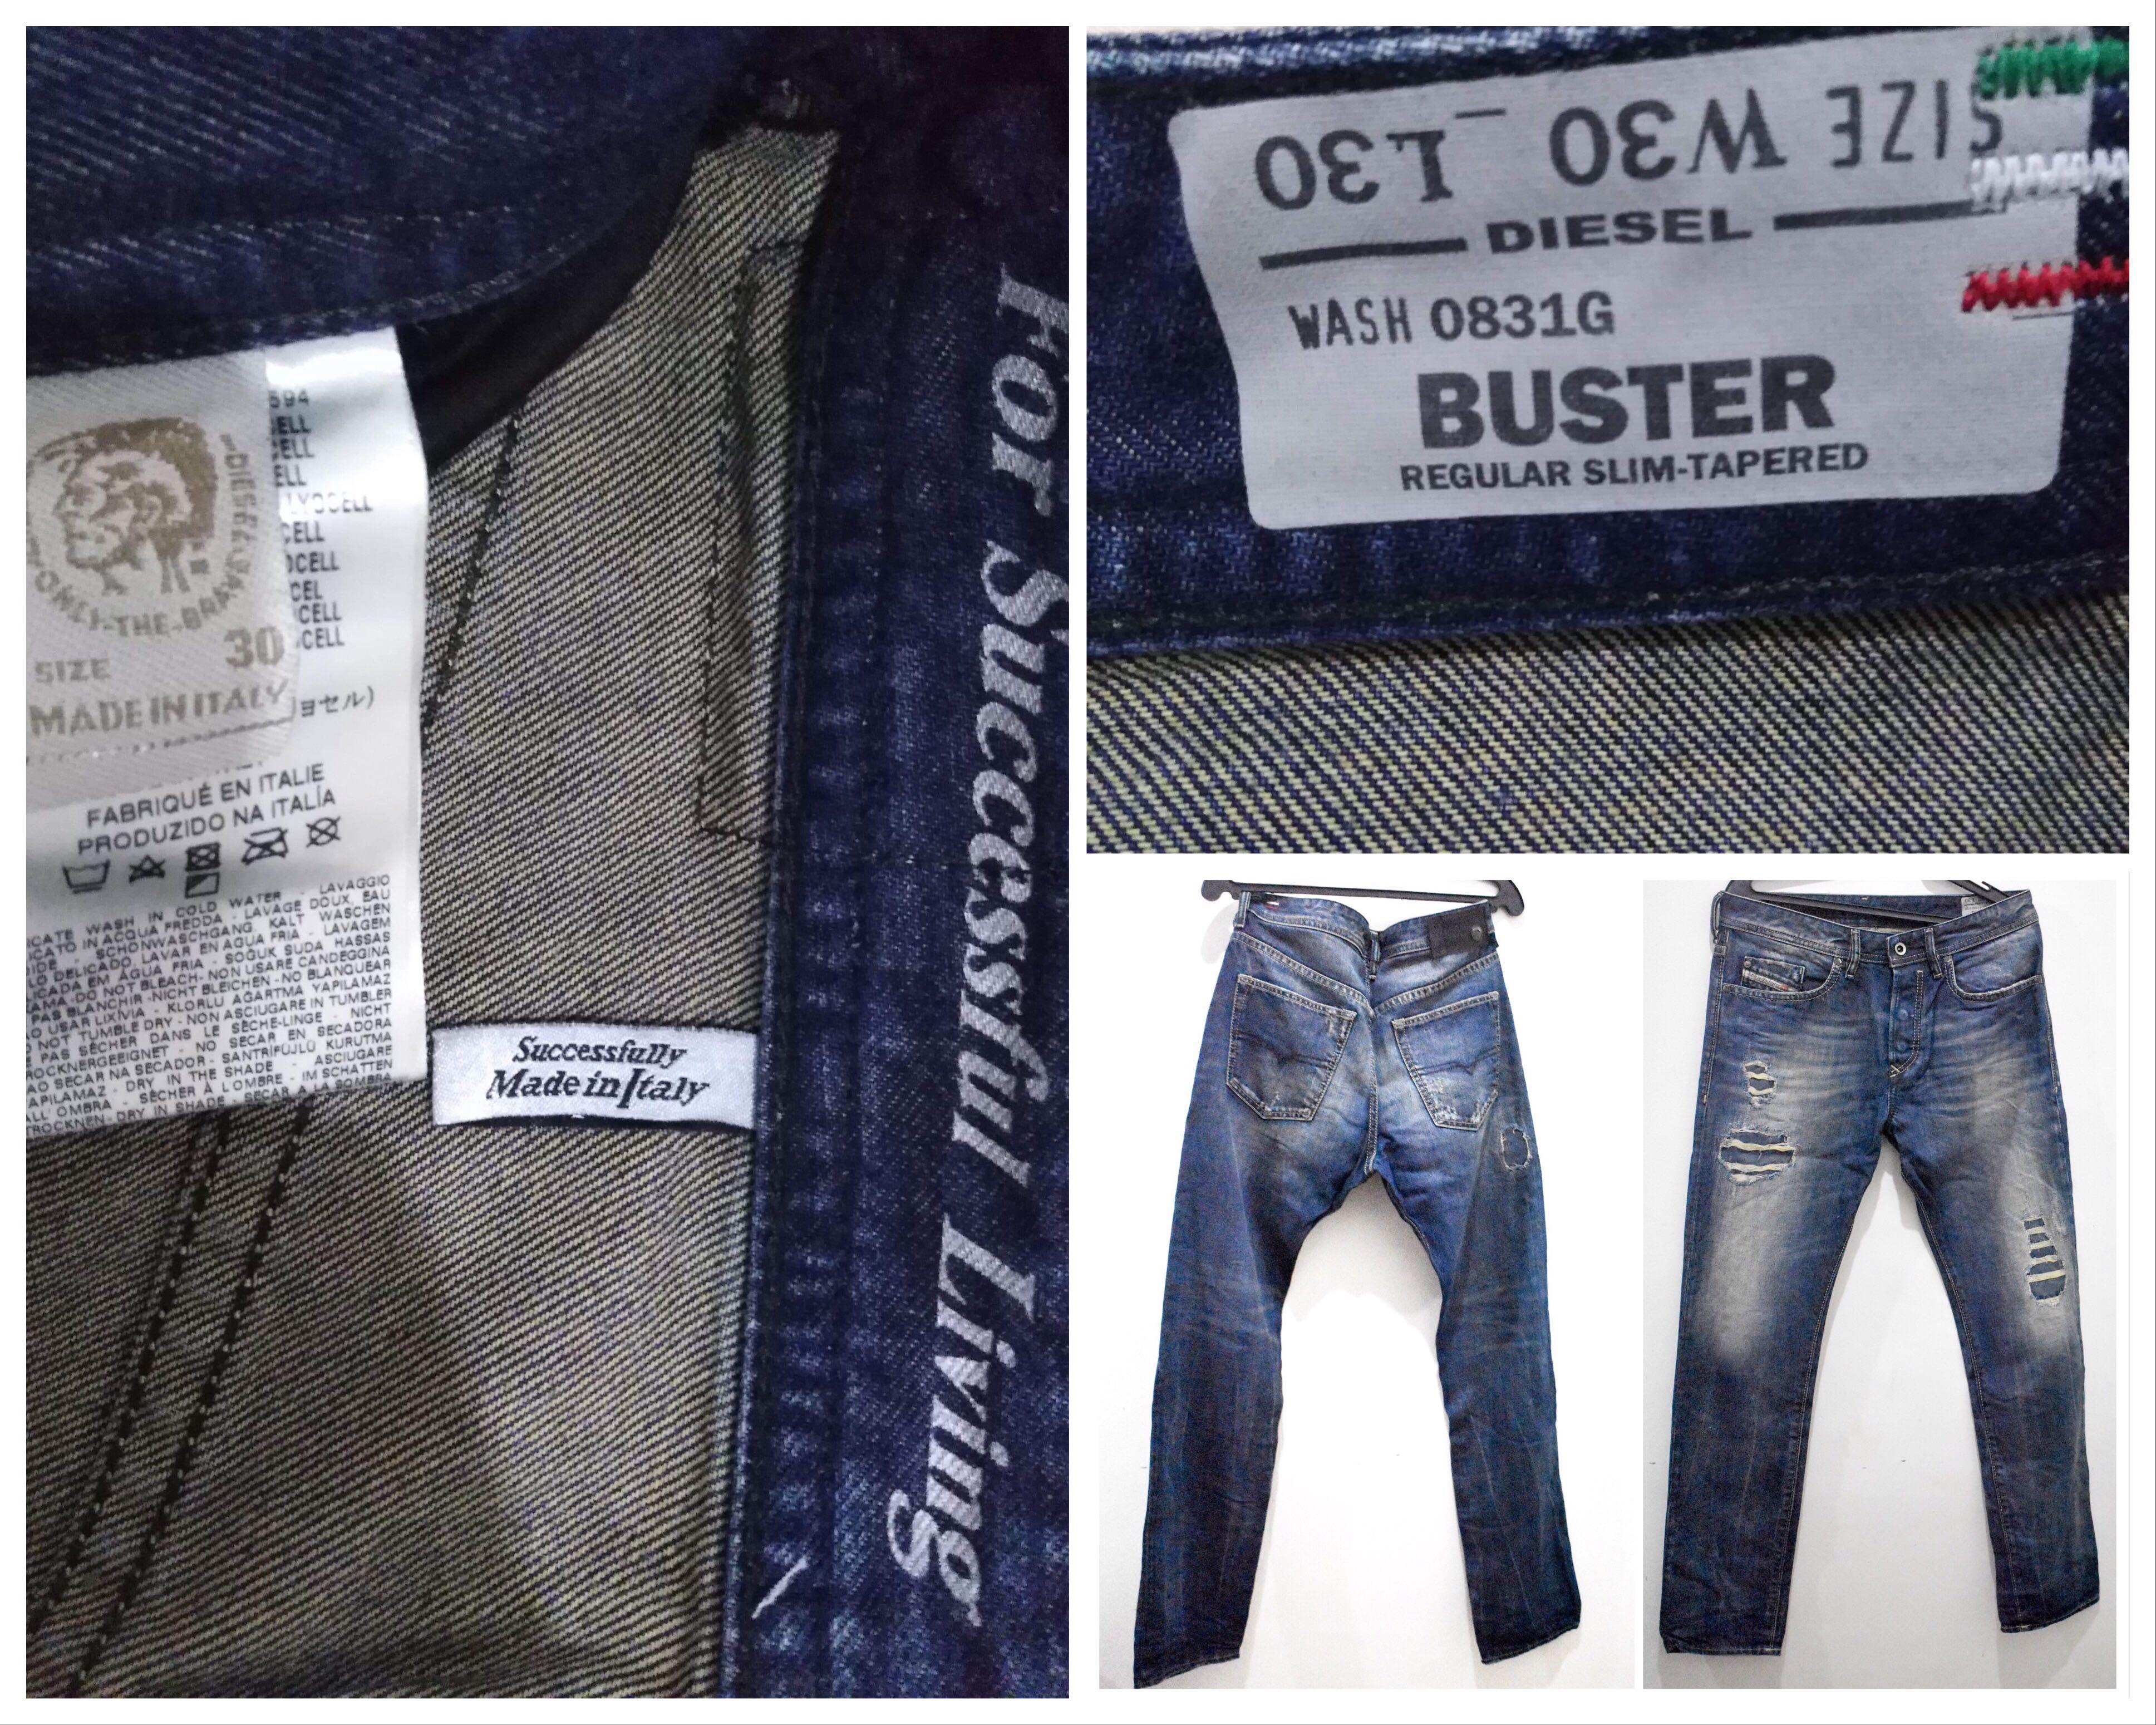 6a6a532c550b5b Mens Pants - Diesel sweat pants, Men's Fashion, Clothes, Bottoms on ...